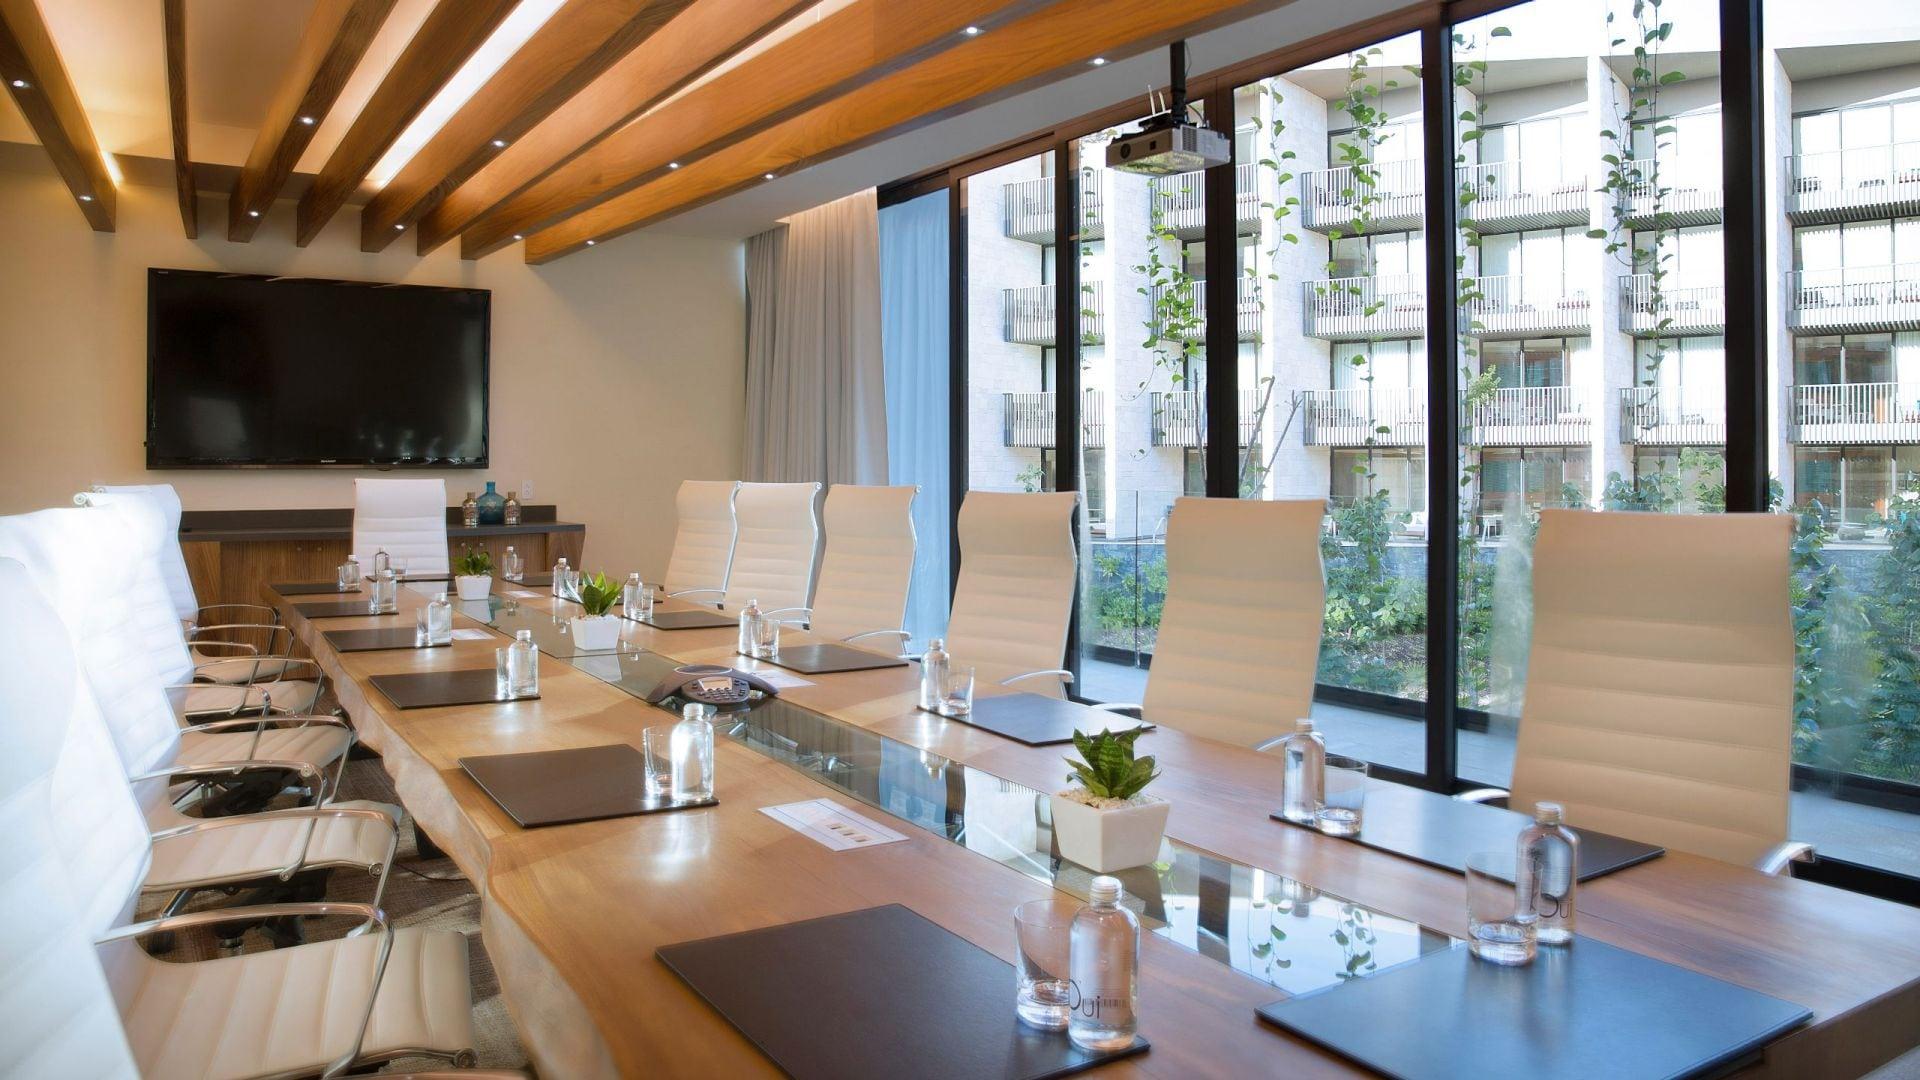 Meeting room with windows